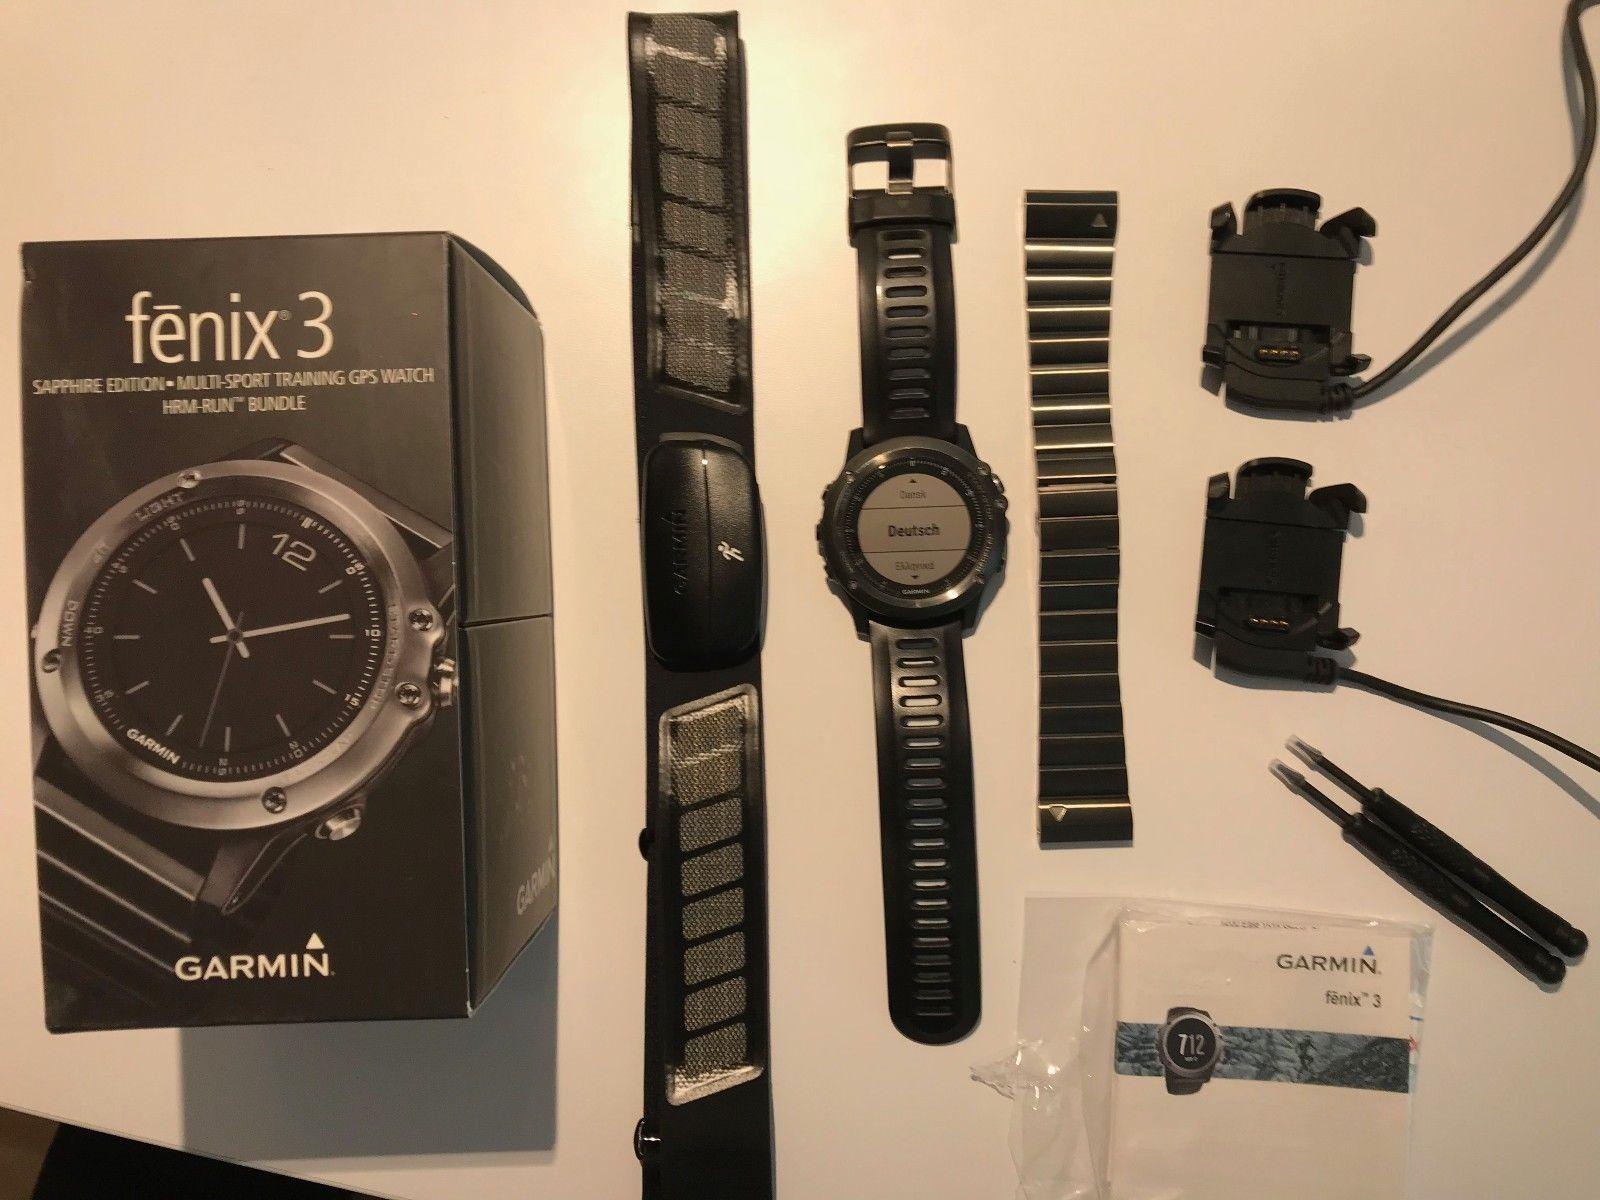 Garmin fenix 3 Sapphire Edition, HRM-Run Bundle